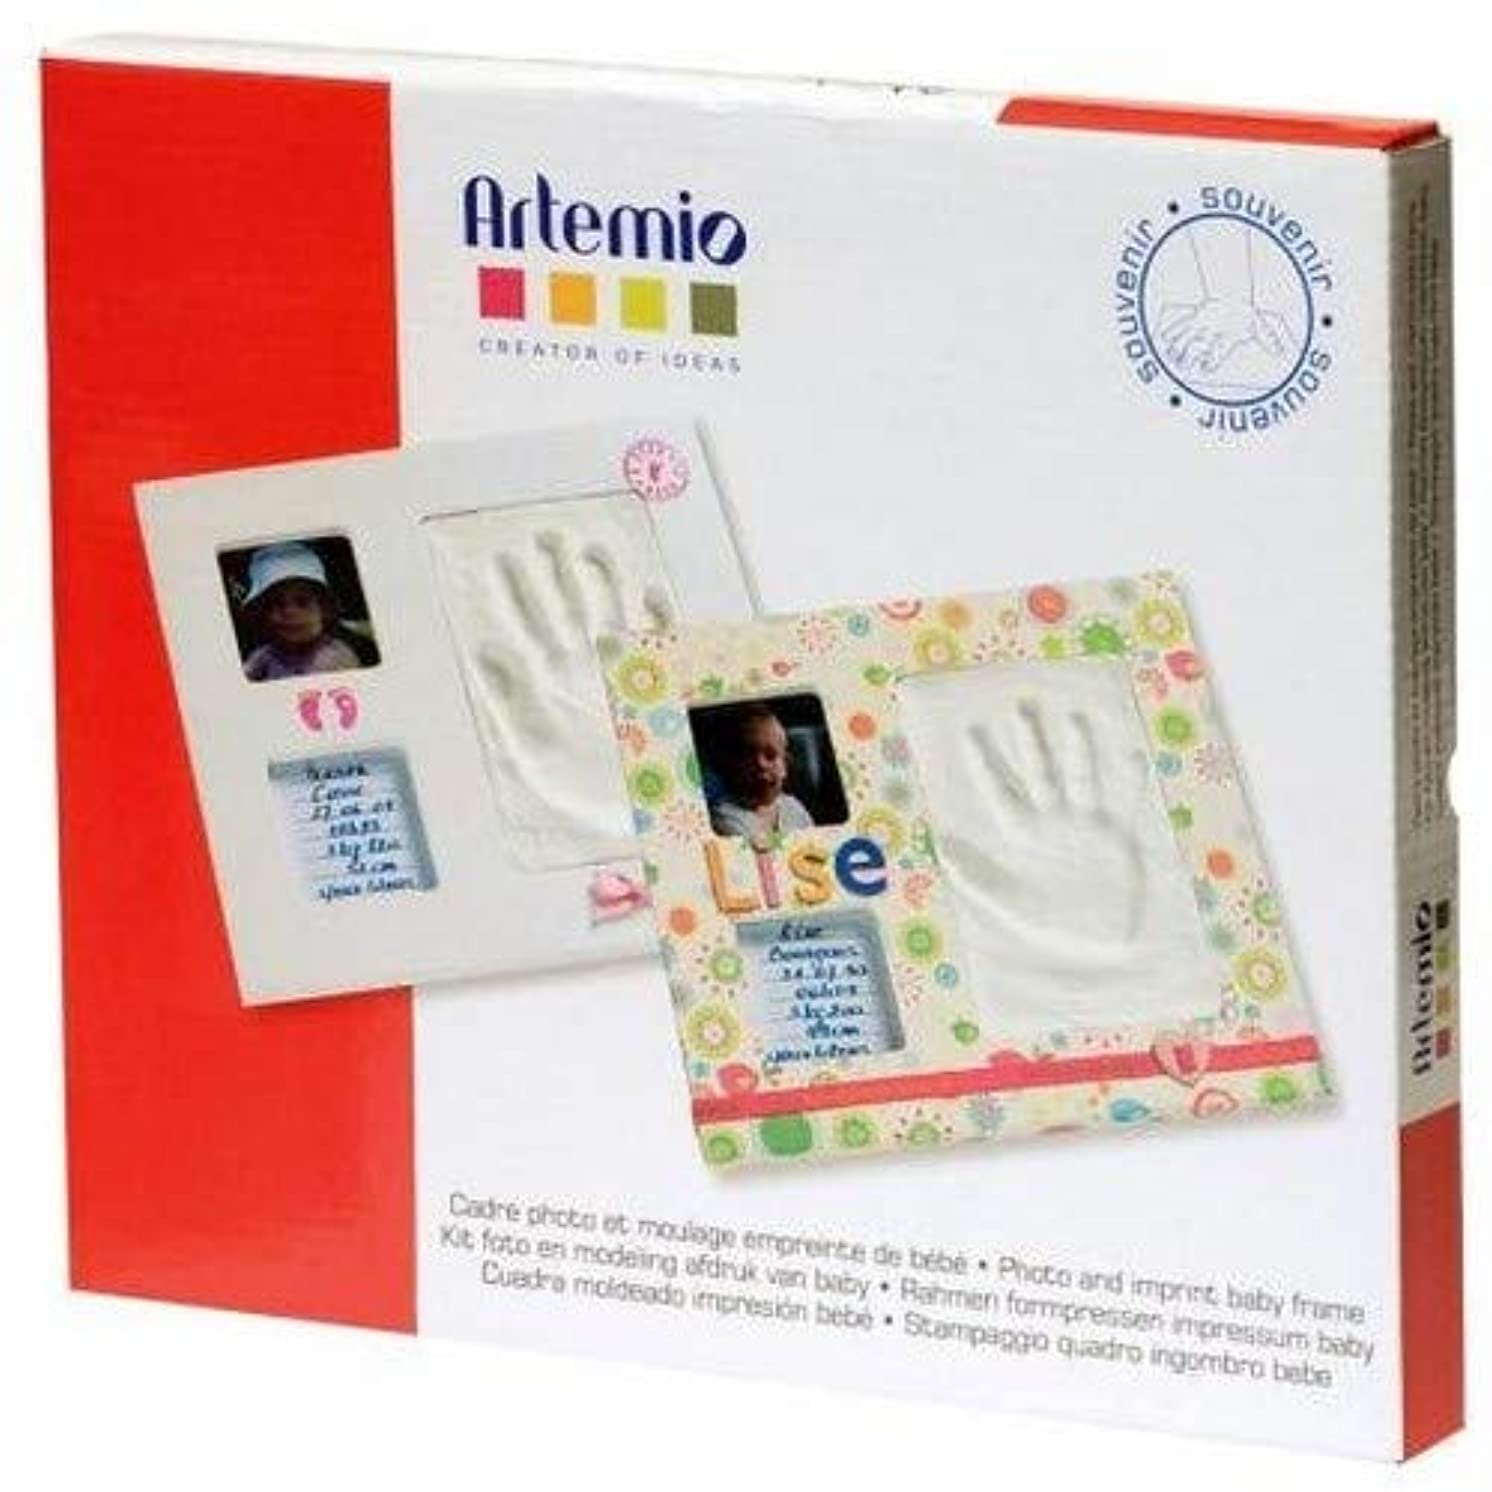 Artemio 13040002 Photo & Imprint Baby Frame, White Frame-28cmx 23.5cmx 1.2Cm